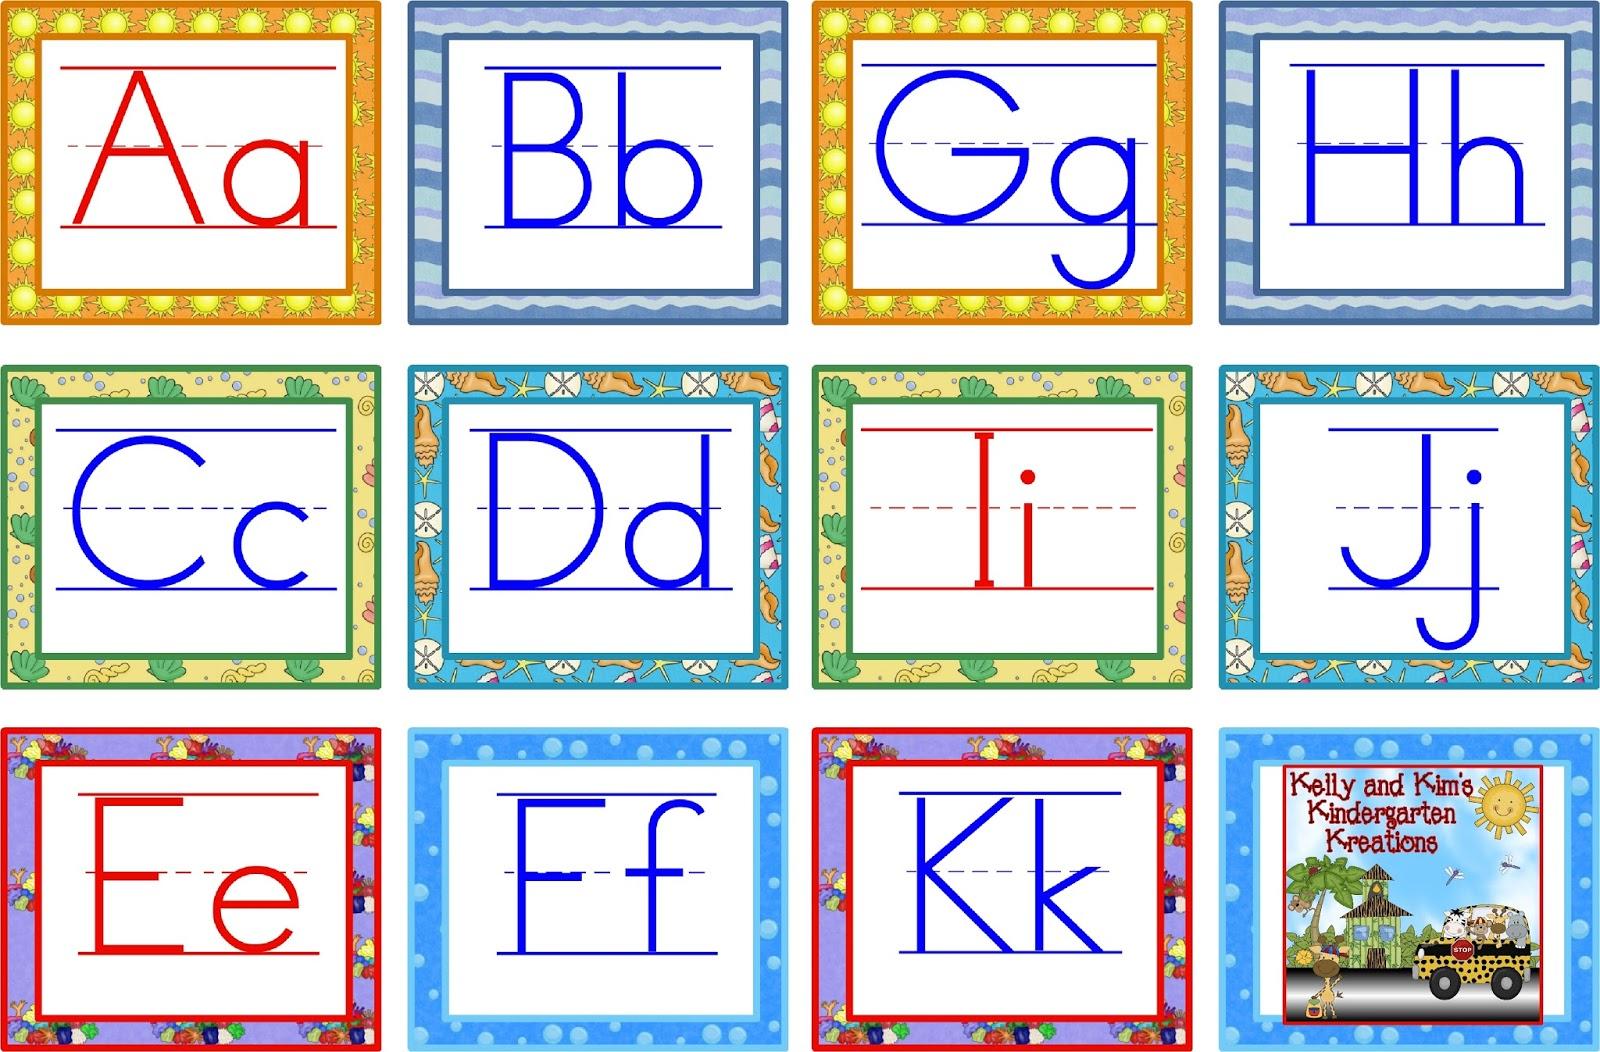 Kelly and Kim's Kindergarten Kreations: Markdown Monday ...